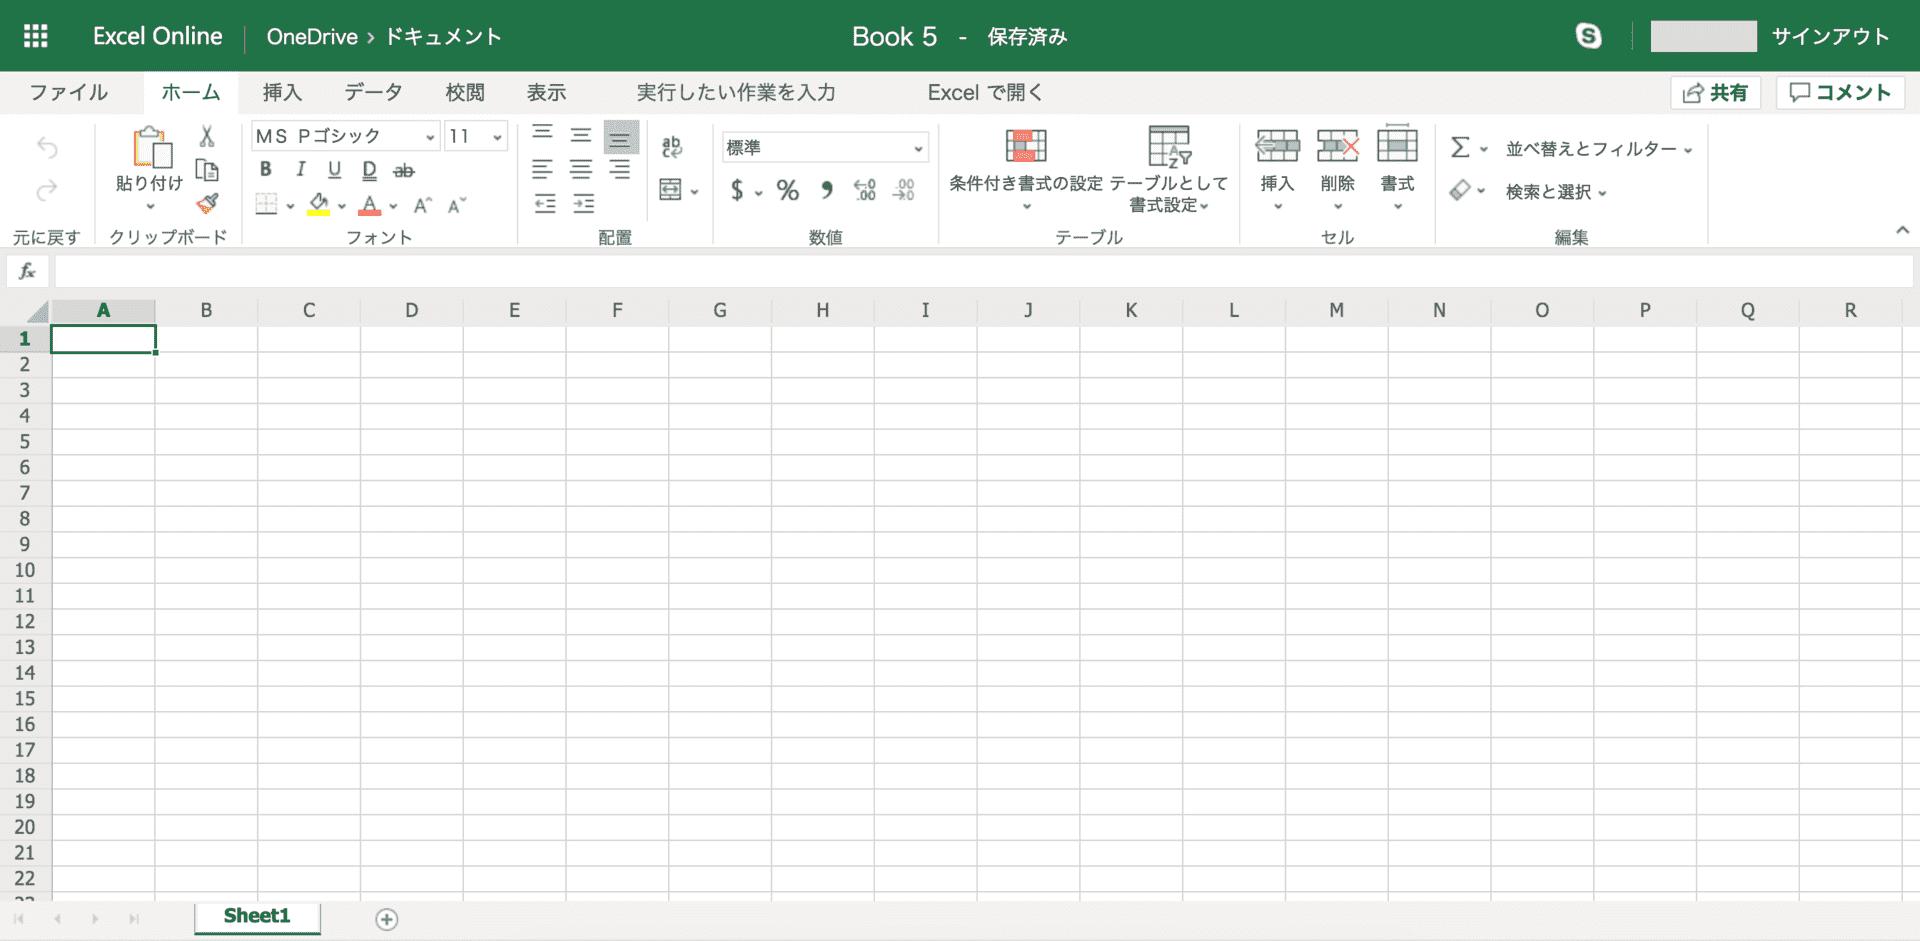 Excel Onlineの画面構成